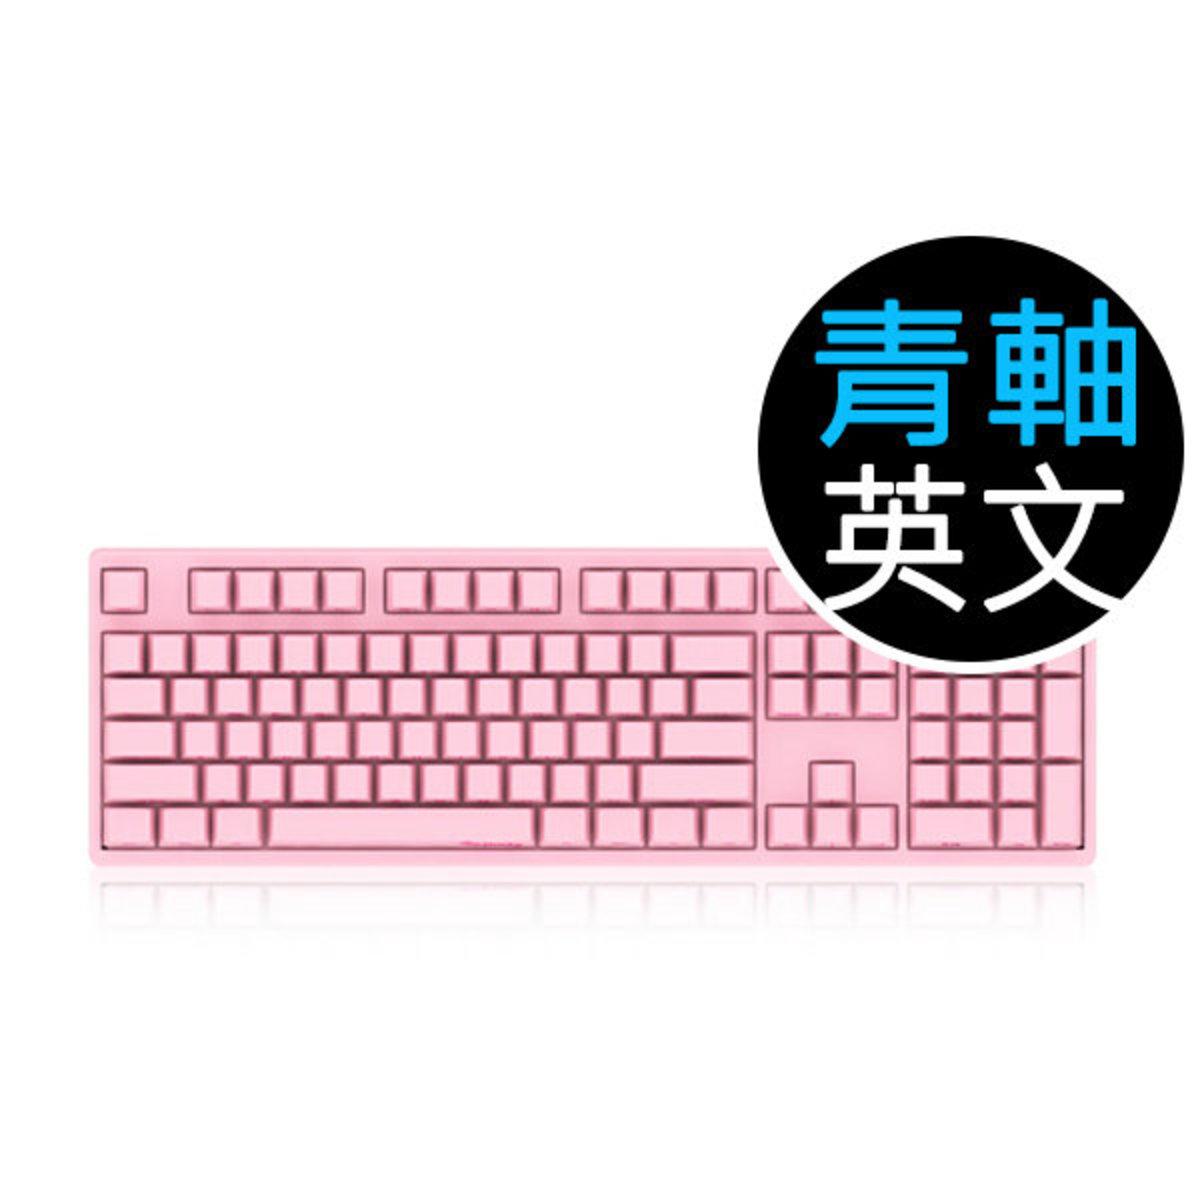 Zerro 3108 MX Blue Side Engraved Switches Keyboard - Pink EN